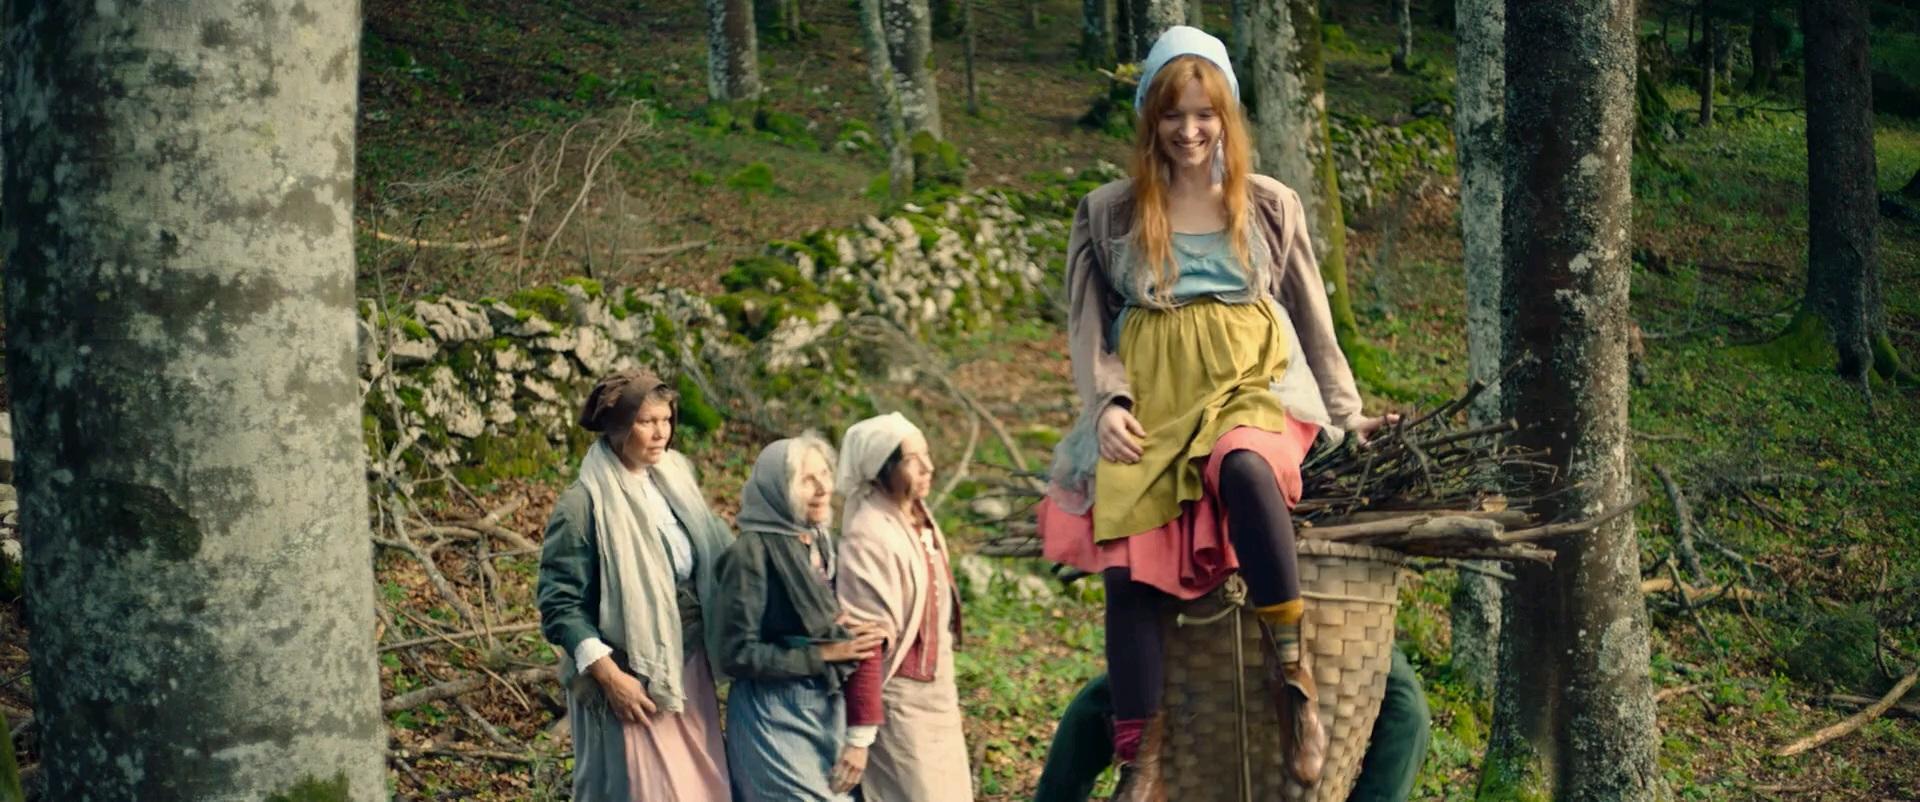 Küçük Cadı | The Little Witch | 2018 | BDRip | XviD | Türkçe Dublaj | m720p - m1080p | BluRay | Dual | TR-EN | Tek Link